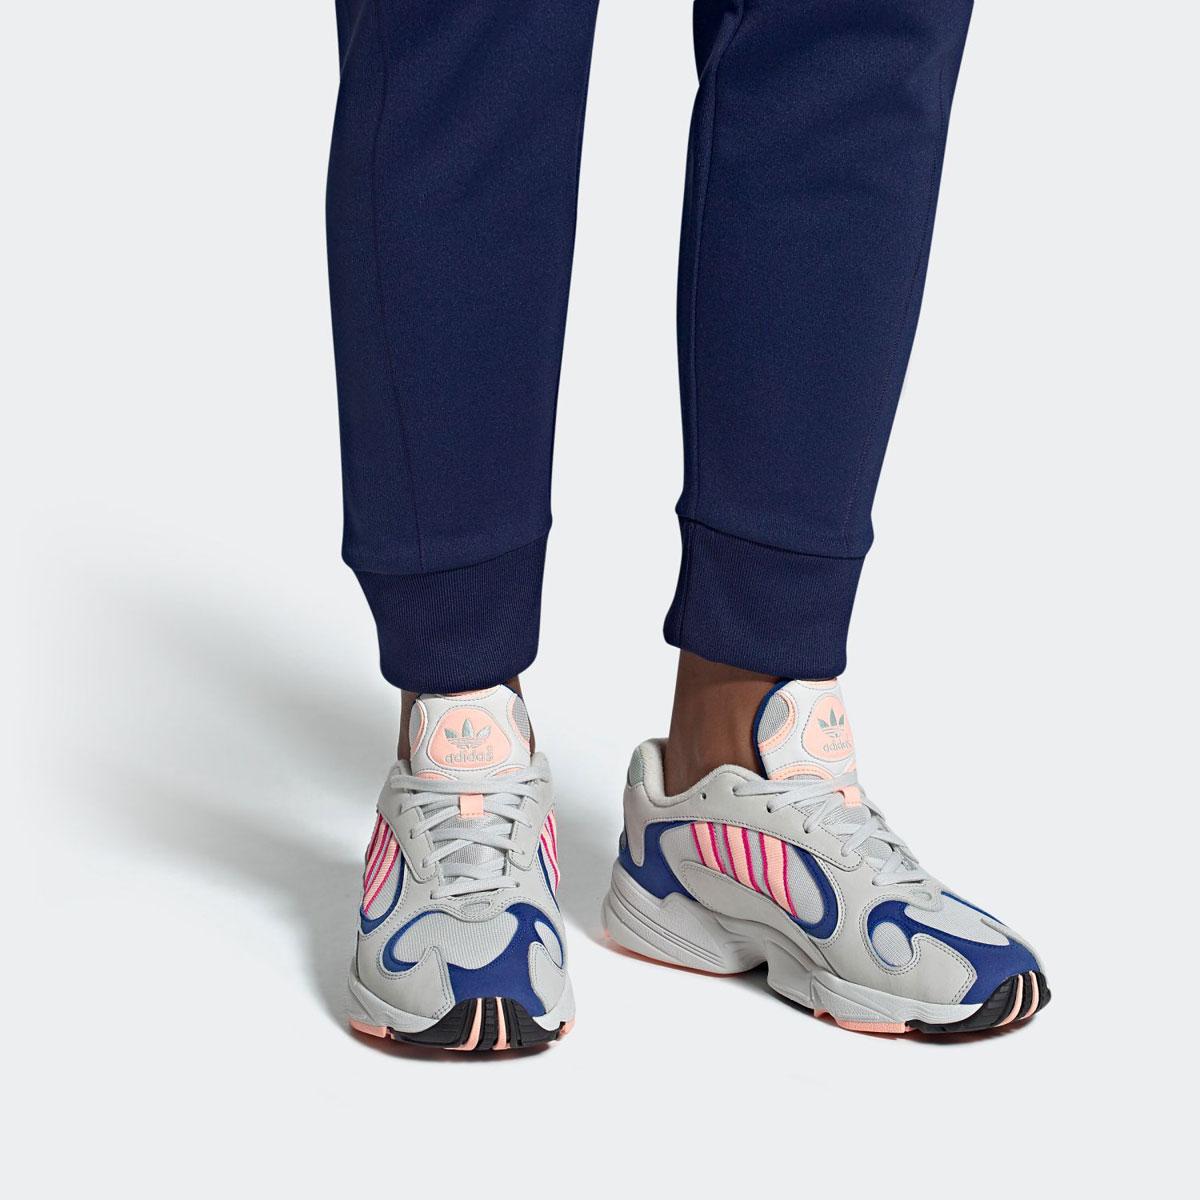 adidas Originals YUNG 1 (CRYSTAL WHITECLEAR ORANGECOLLEGIATE ROYAL) (Adidas originals young people 1)